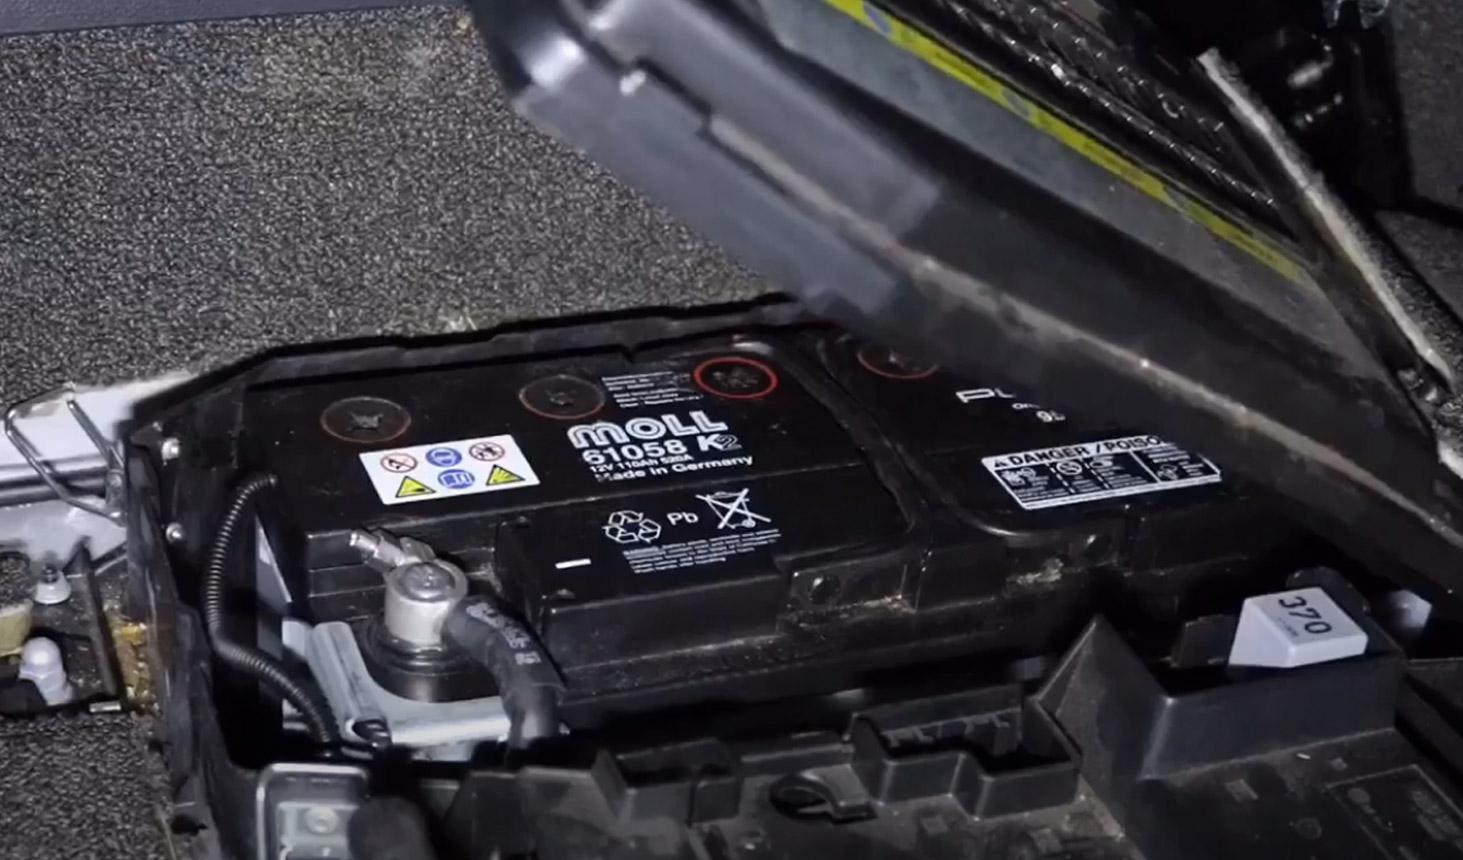 8-tuto-changement-batterie-audi-q7.jpg